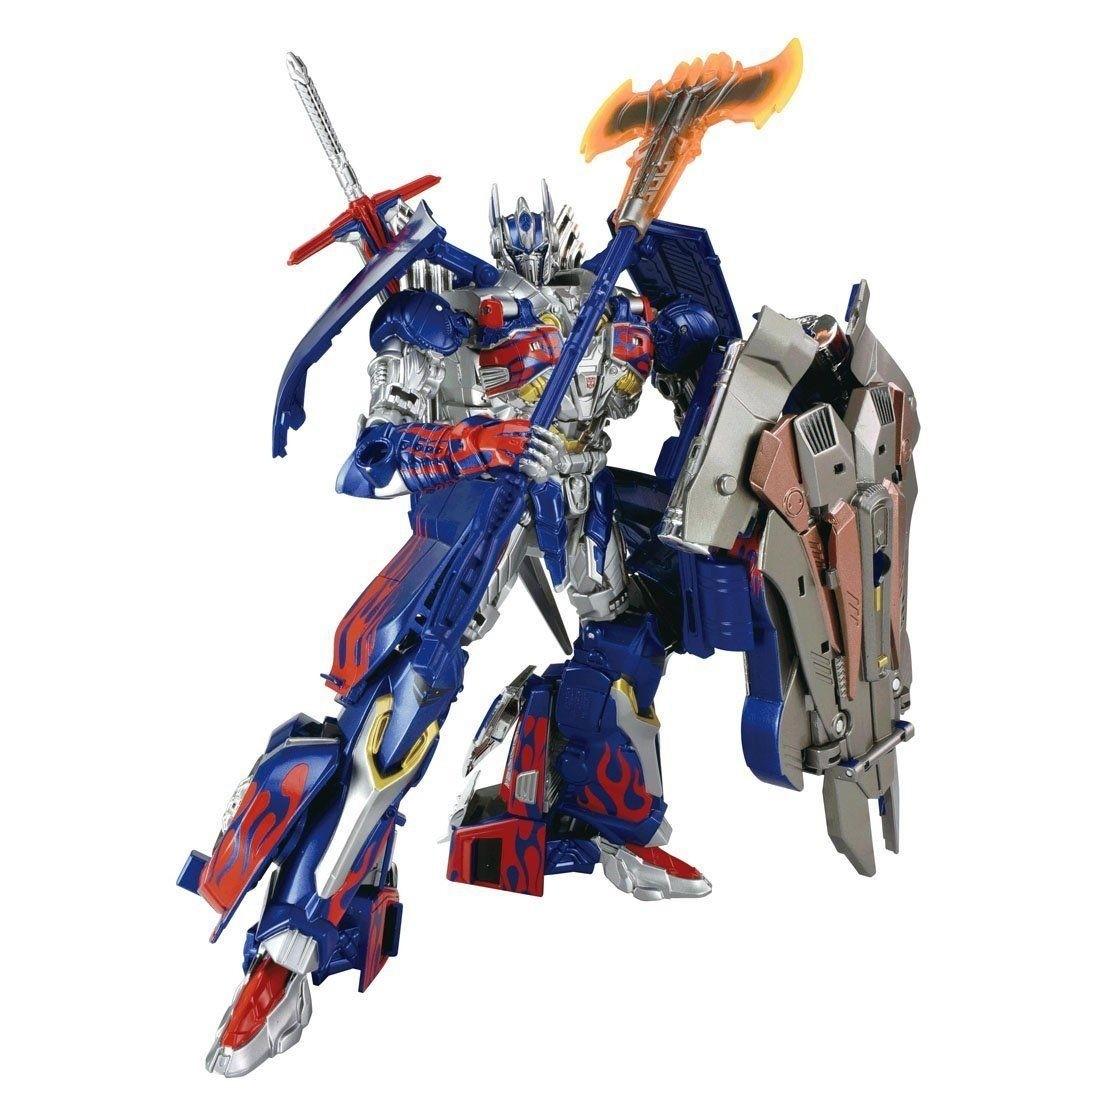 Transformers The Last Knight TLK-15 Caliber Optimus Prime